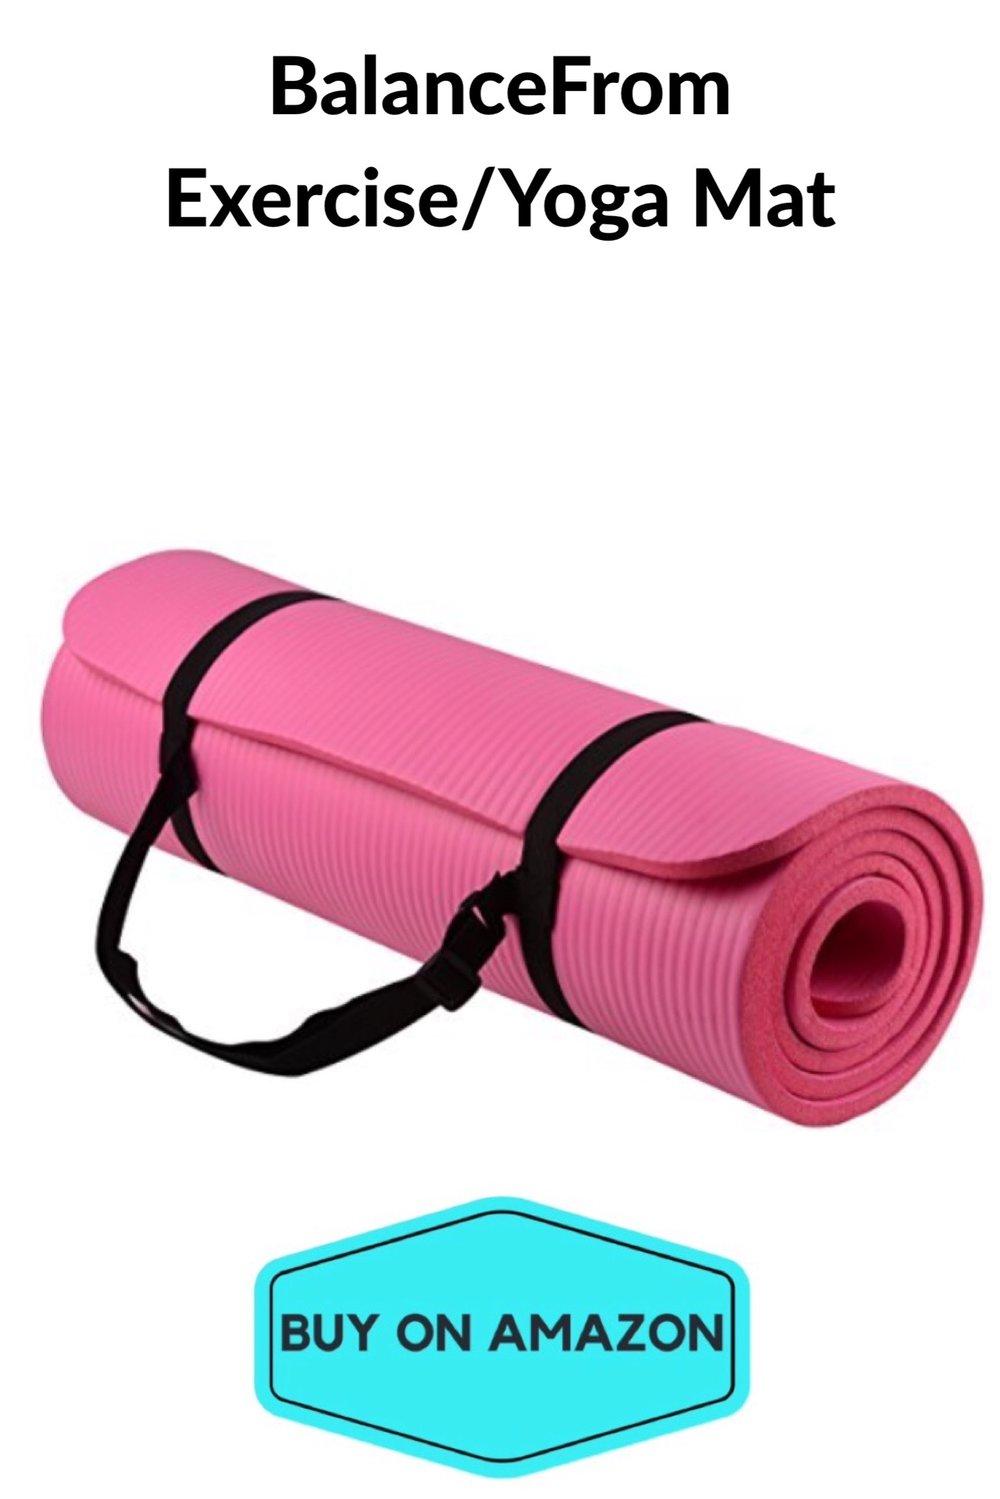 BalanceFrom Exercise/Yoga Mat